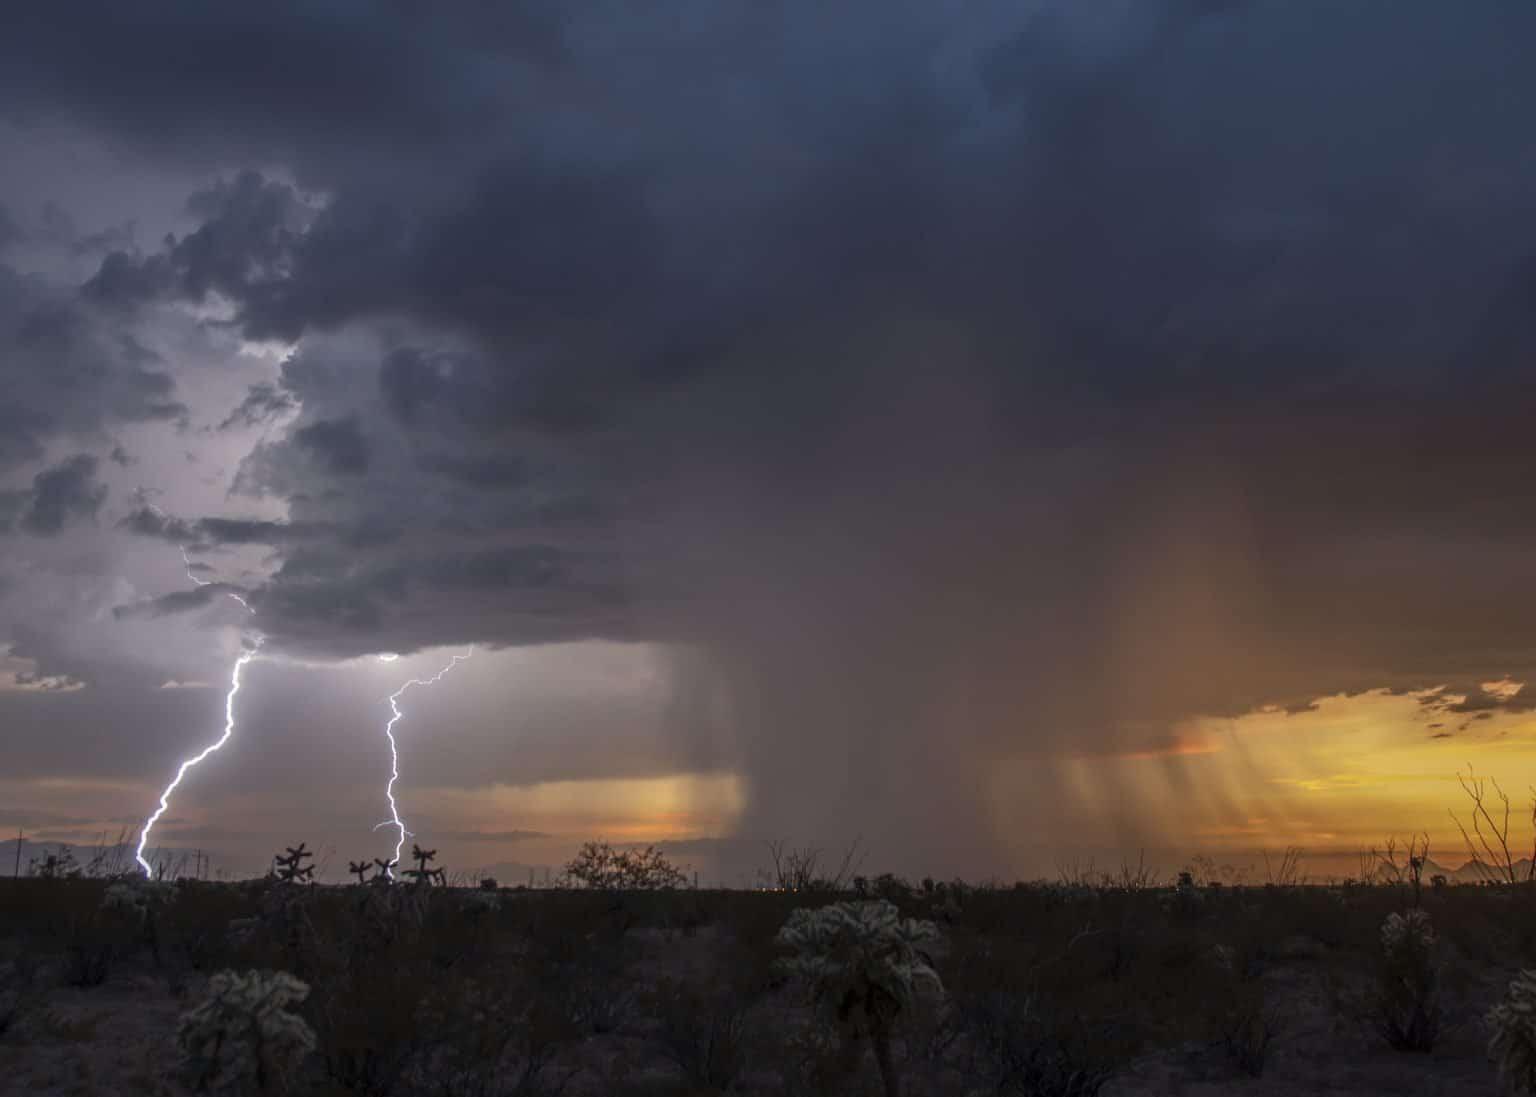 arizona monsoon thunderstorm with rain and lightning